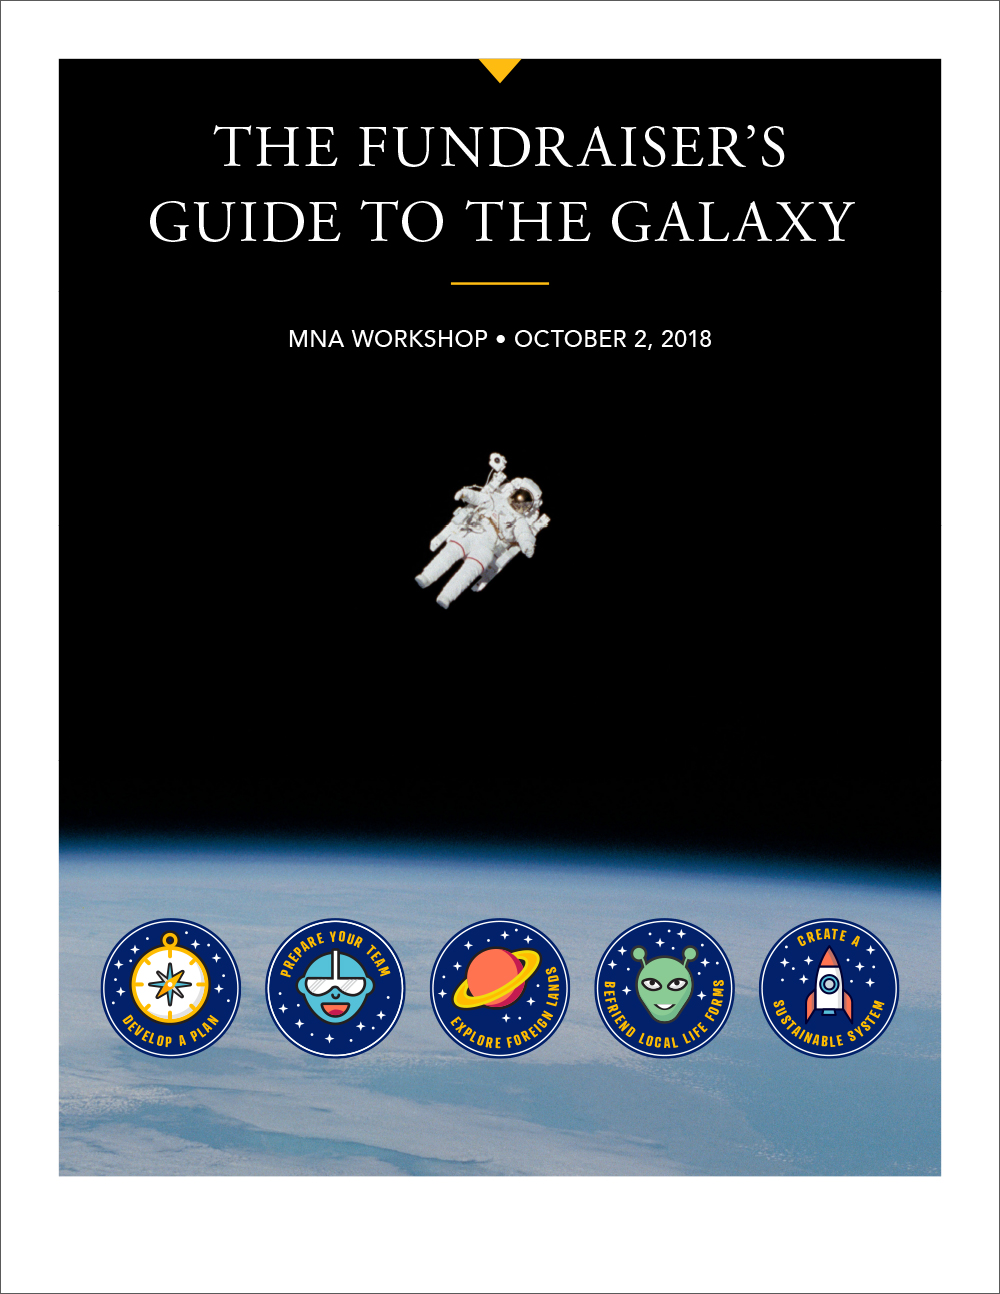 MNA-GuideToTheGalaxy-Workbook-1.jpg